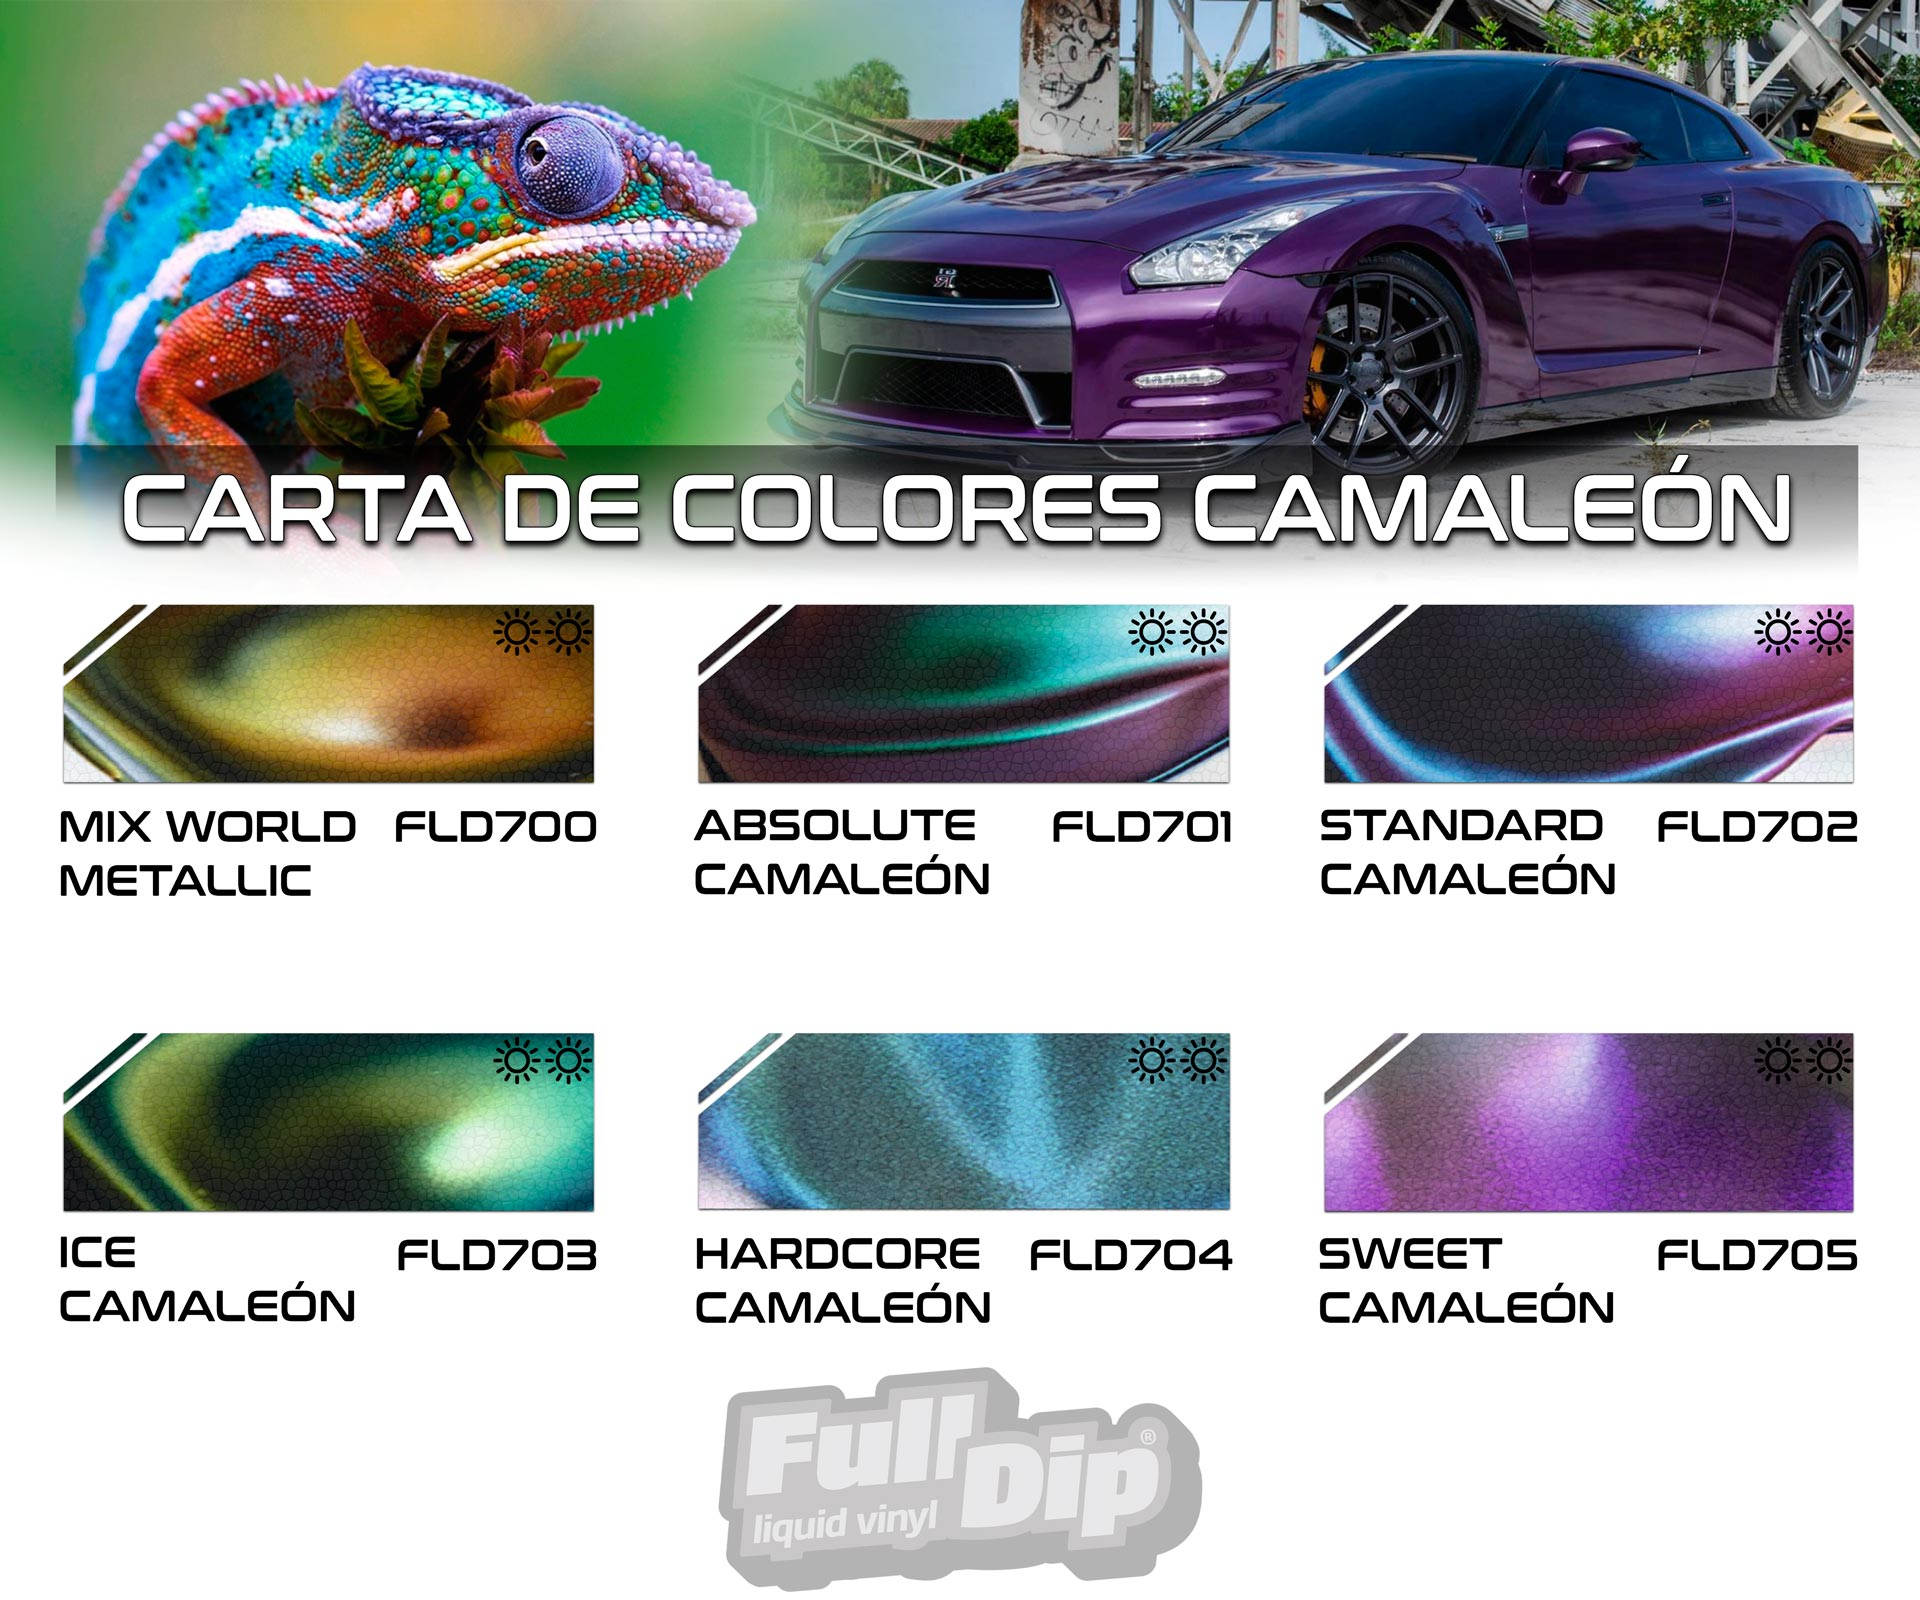 CARTA-COLORES-CAMALEON-FULLDIP-WEB-2020_